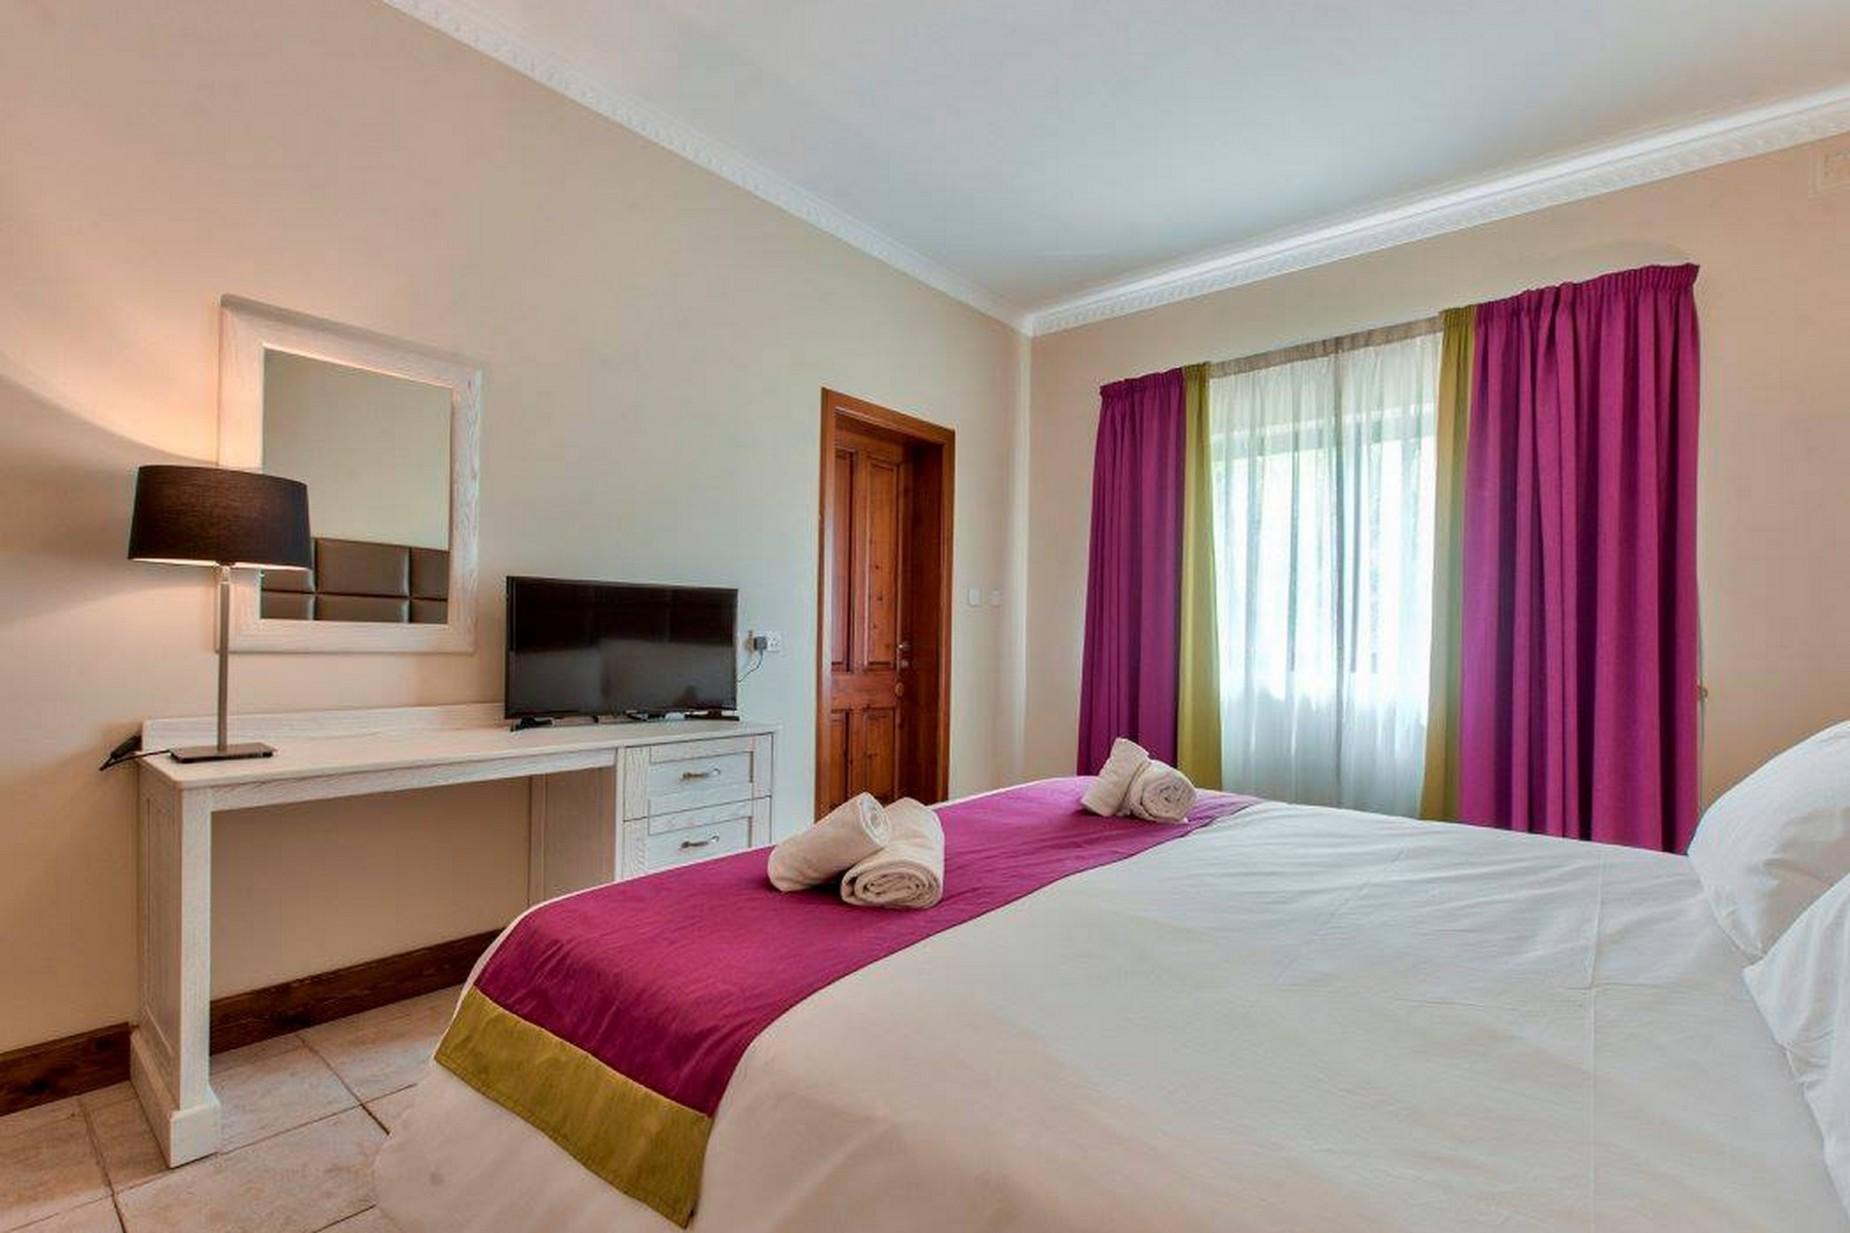 3 bed Villa For Rent in Mellieha, Mellieha - thumb 10